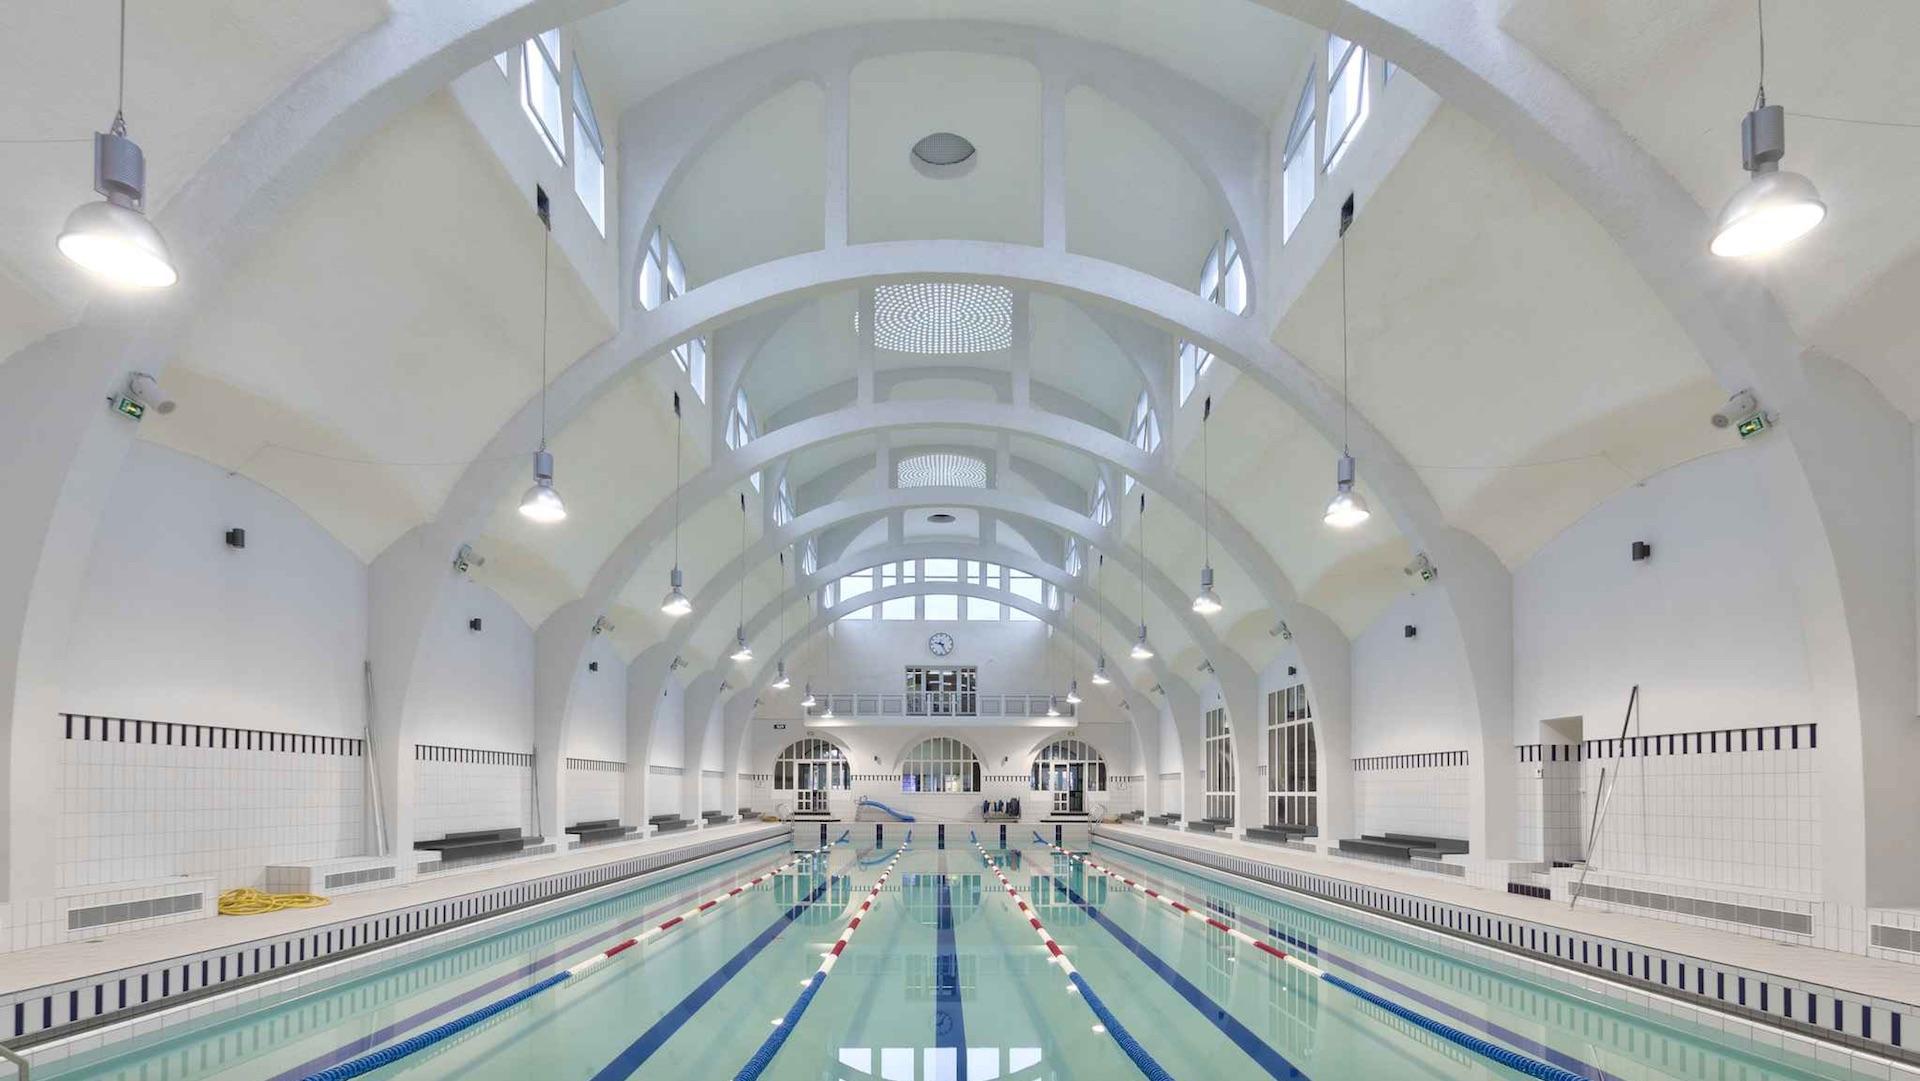 Une piscine parisienne sera chauff e gr ce un datacenter for Piscine parisienne